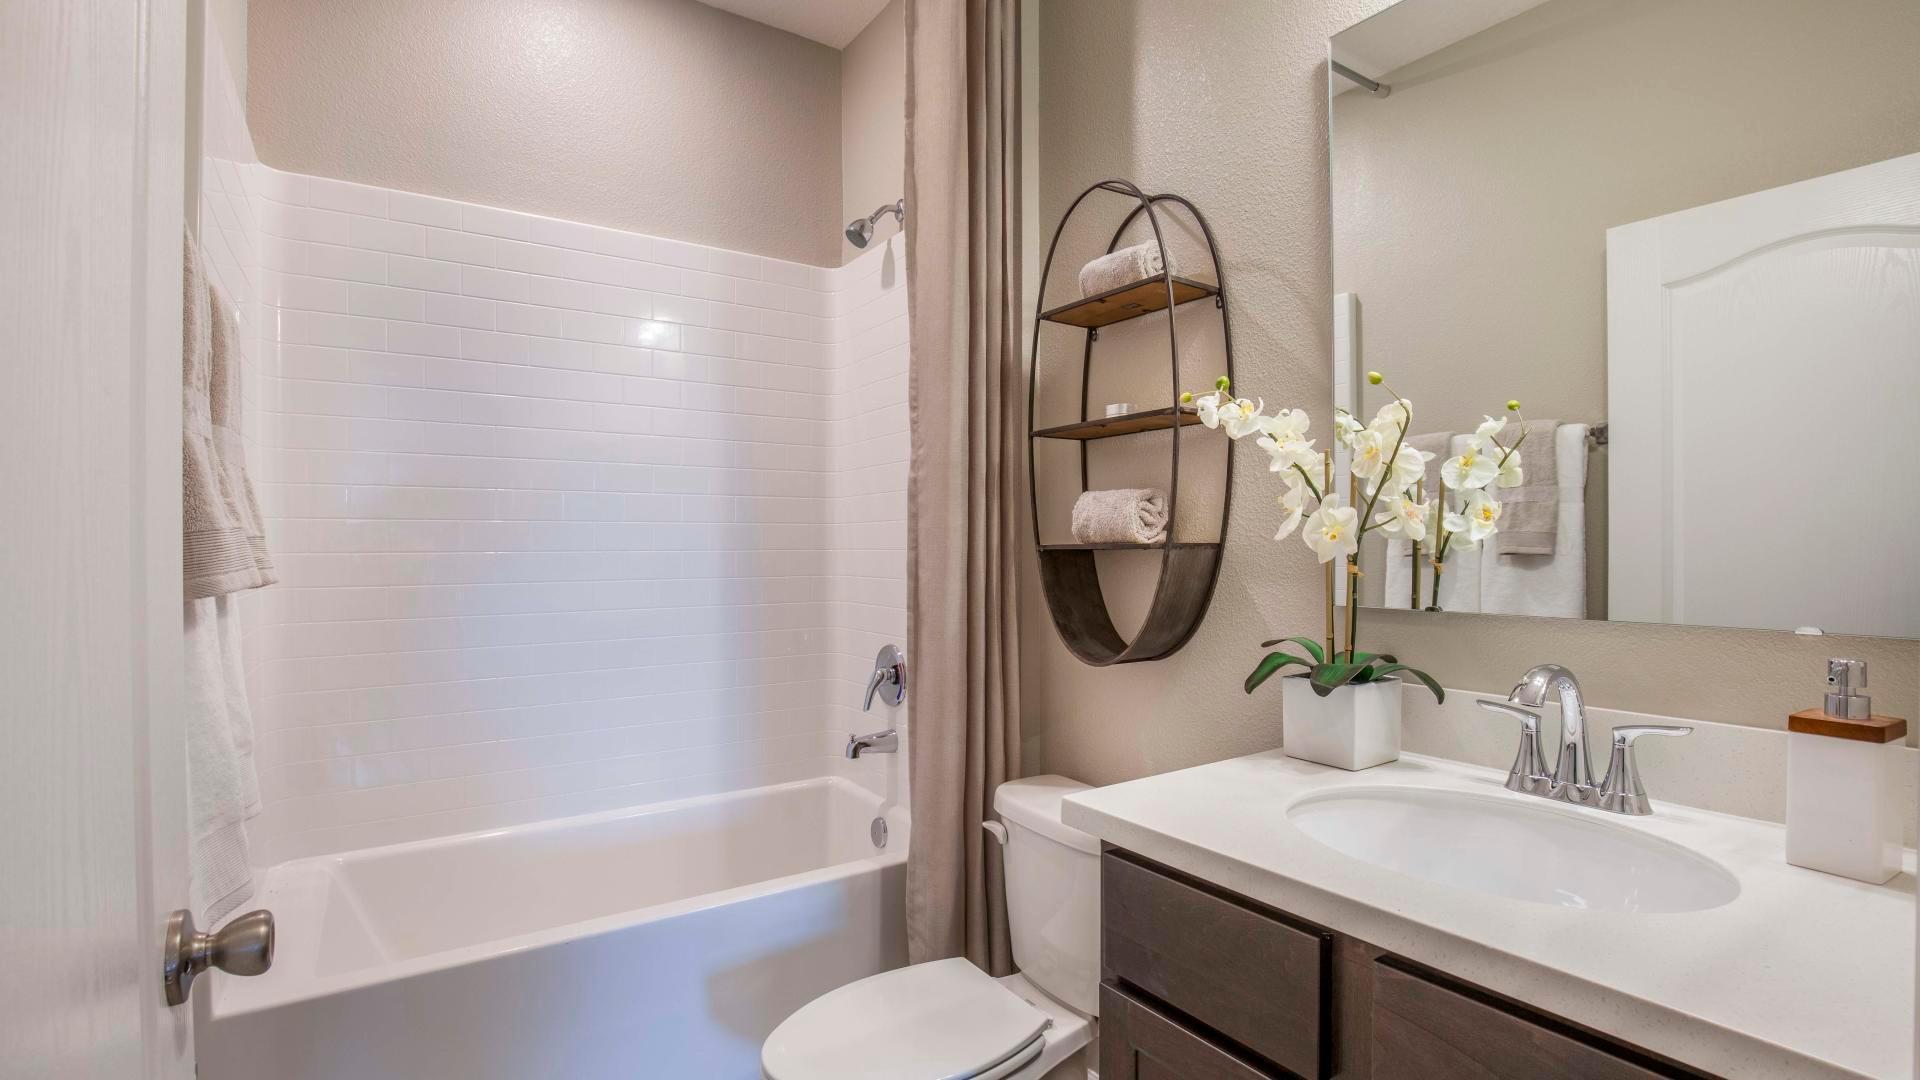 Bathroom featured in the Ashton By Maronda Homes in Daytona Beach, FL